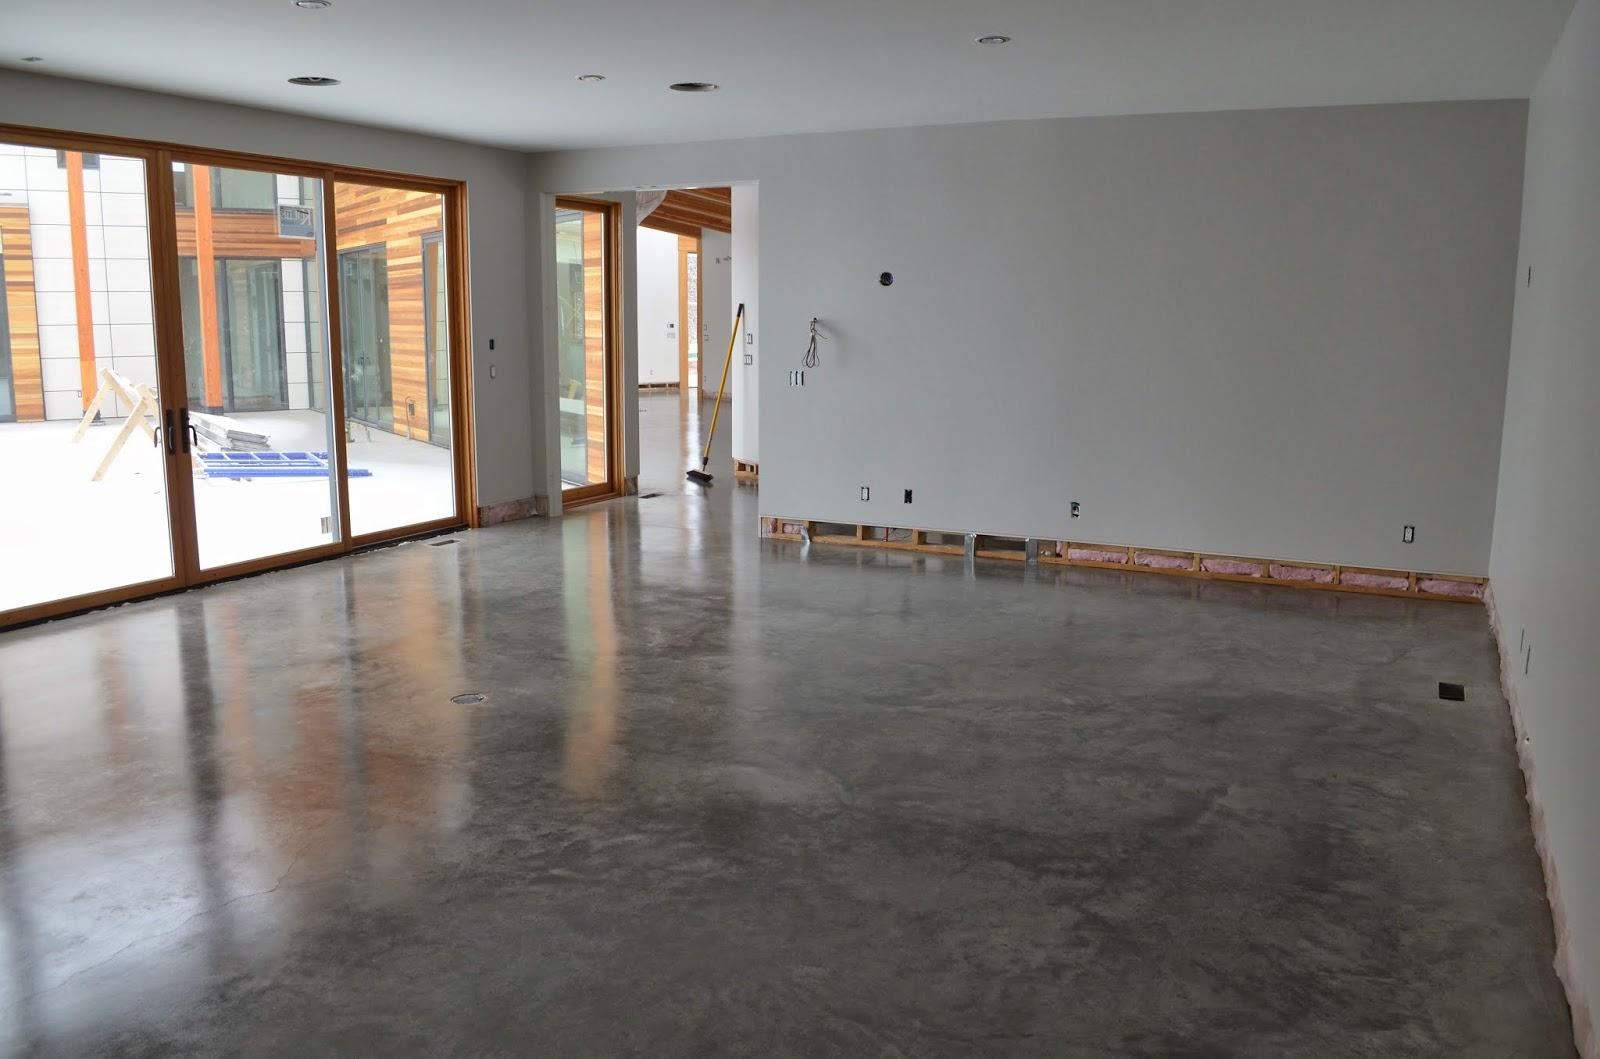 Mode Concrete Natural Concrete Floors Look Amazing In